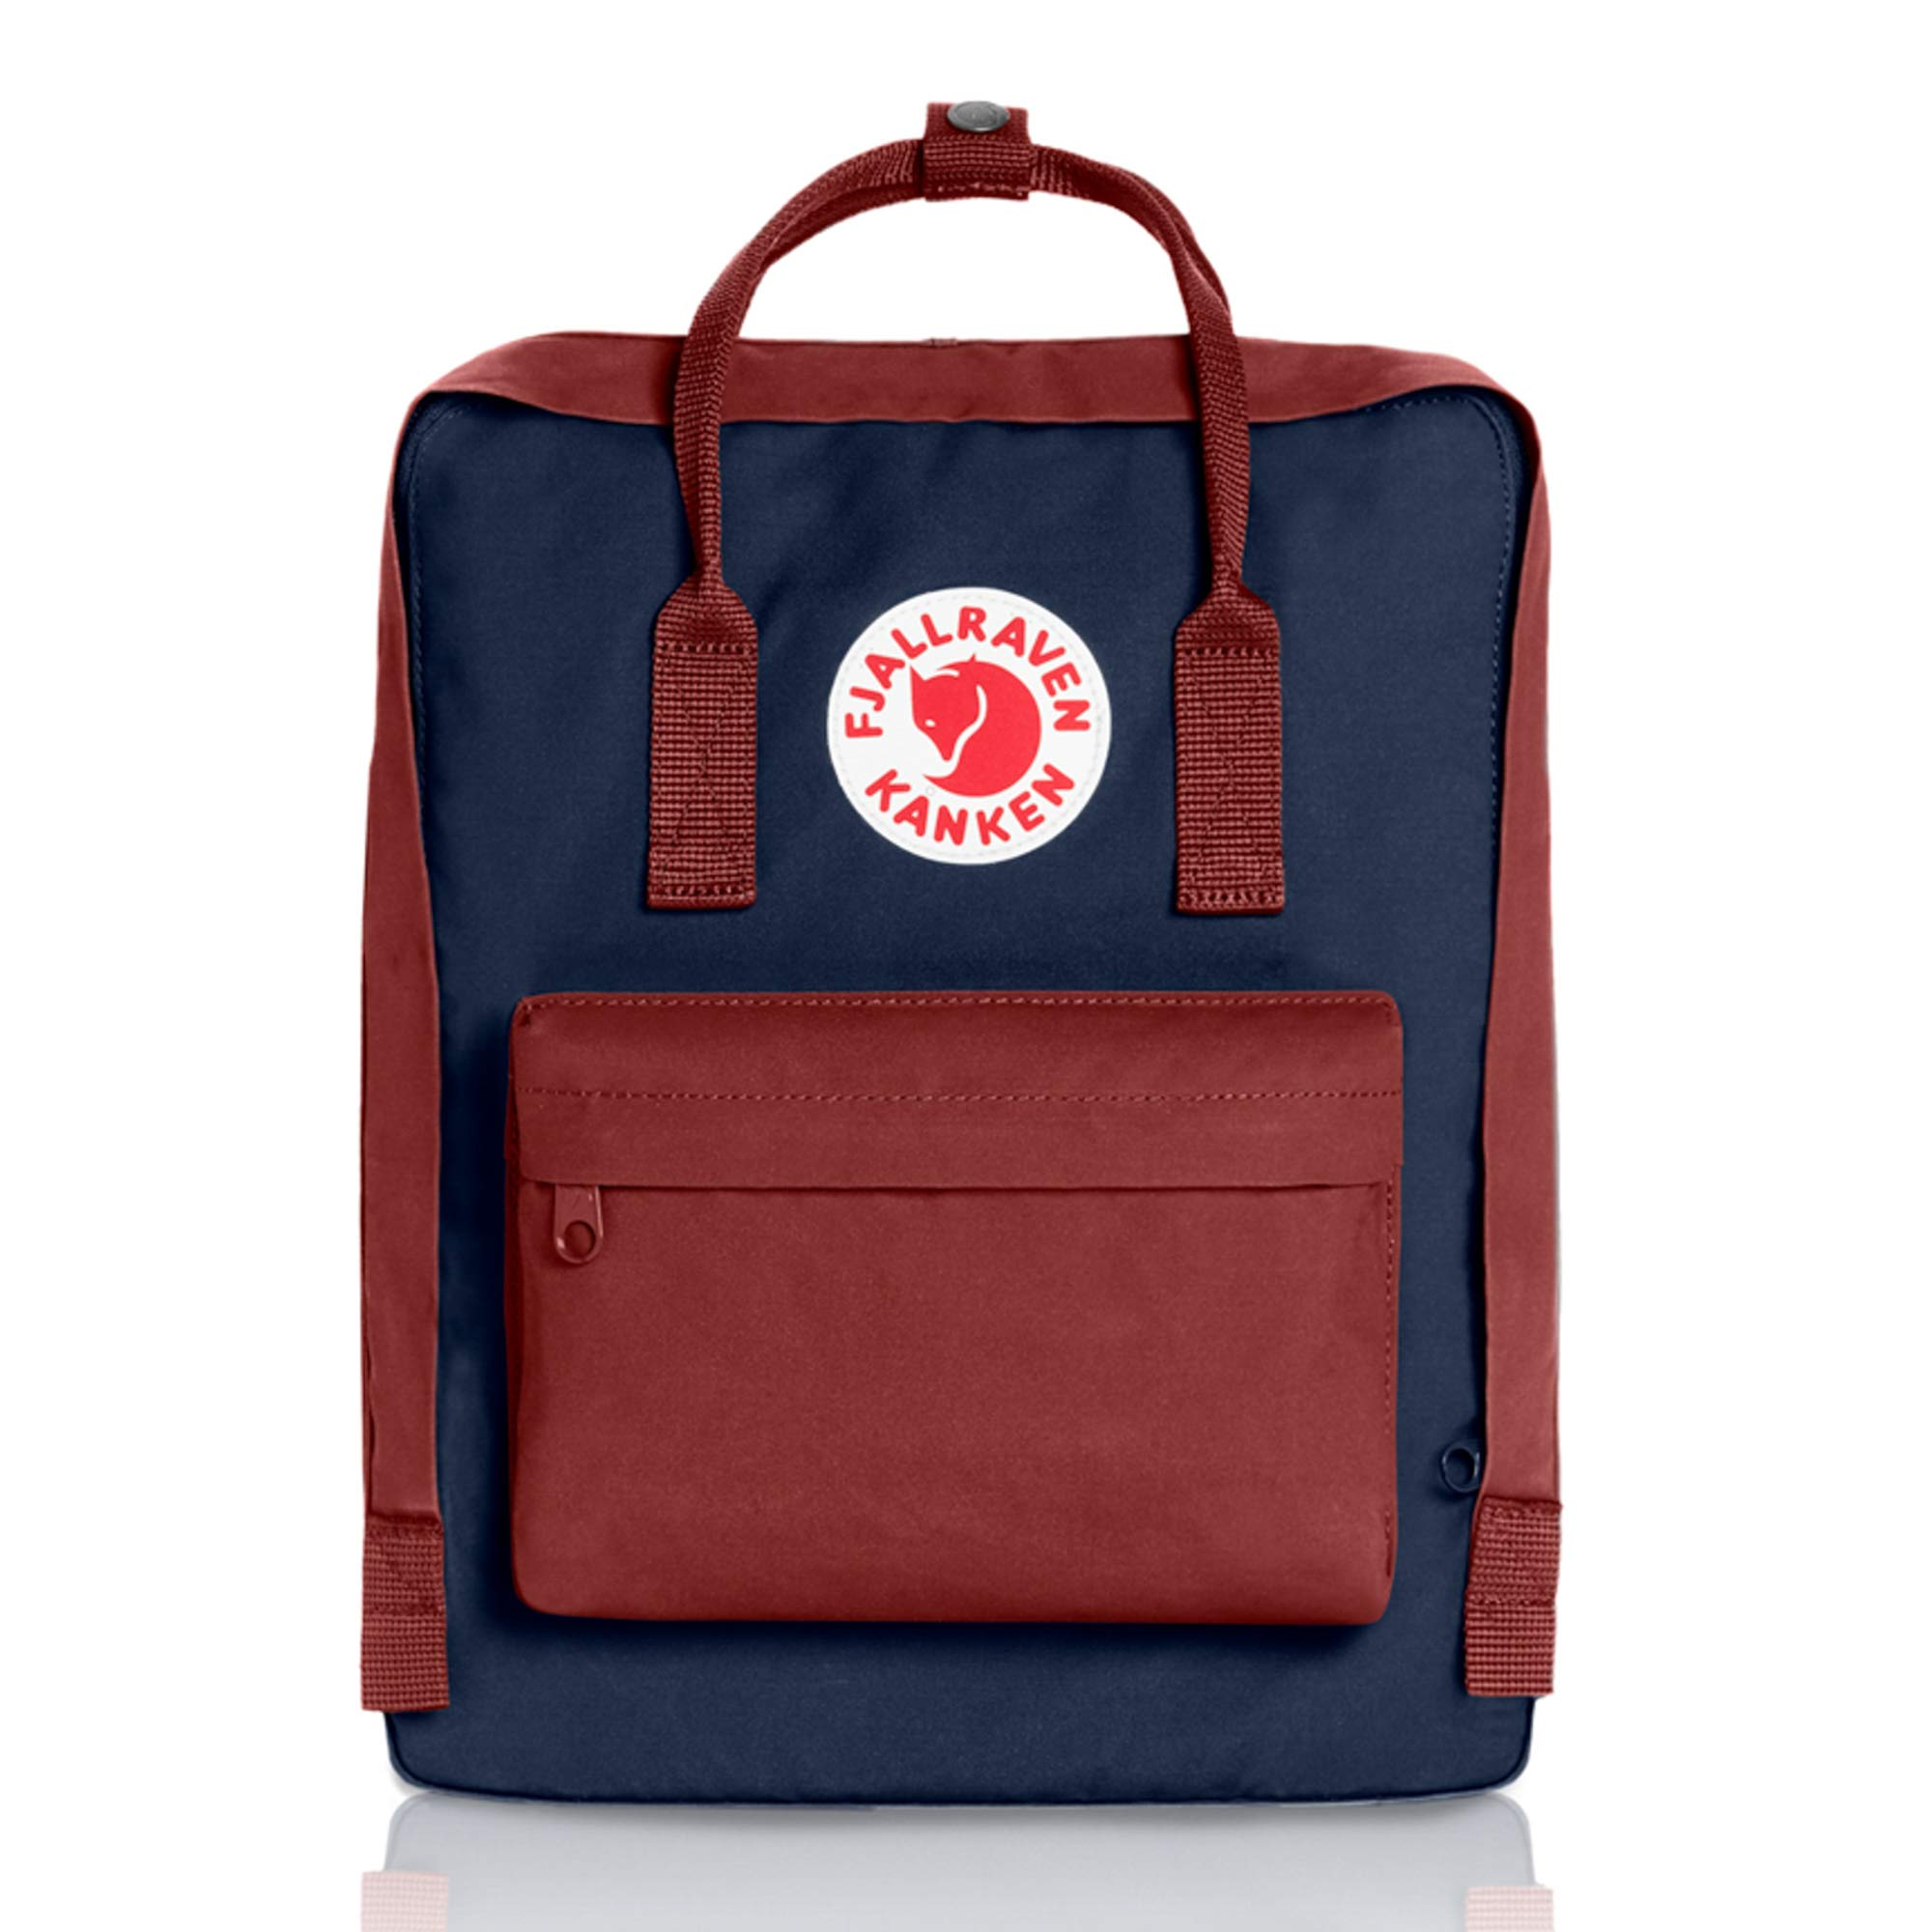 Fjallraven - Kanken Classic Backpack for Everyday, Royal Blue/Ox Red by Fjallraven